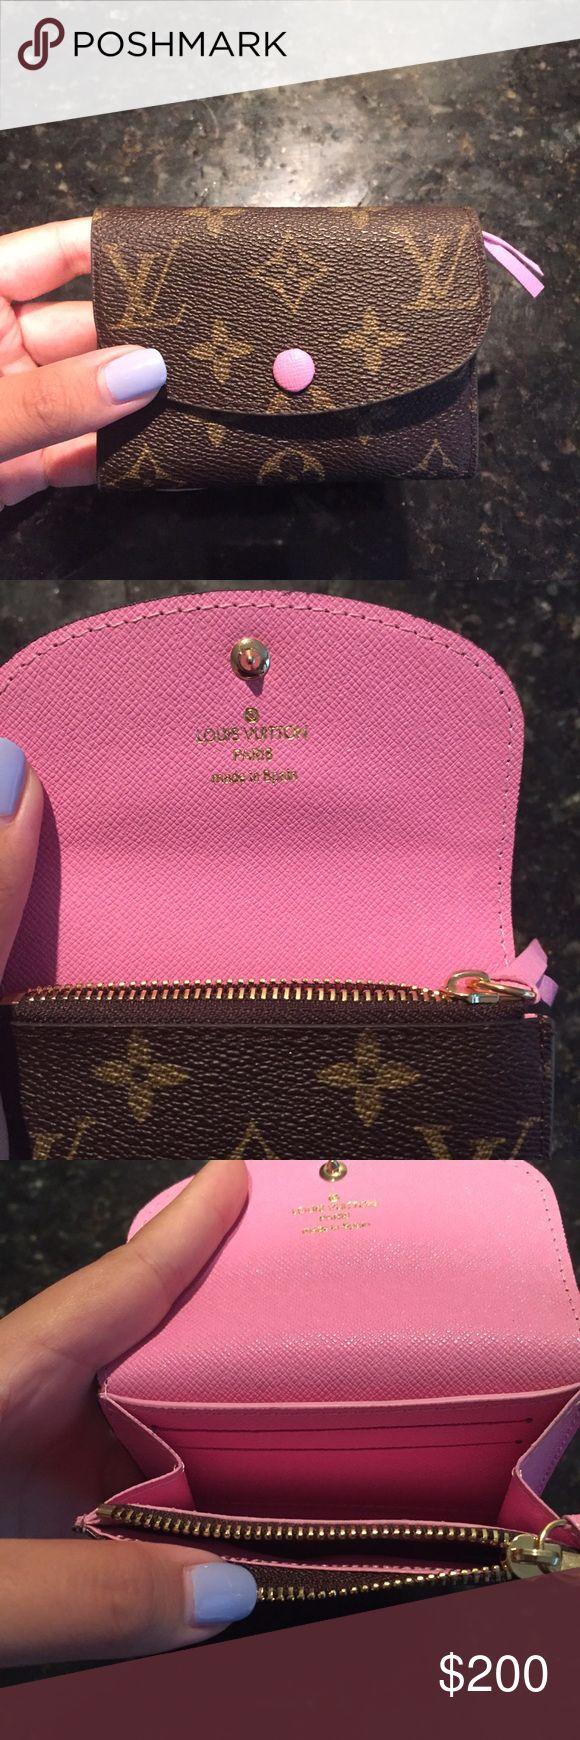 Louis Vuitton Rosalie Coin Purse 2 credit card slots, 1 zipped coin pocket, real calf leather Louis Vuitton Bags Wallets